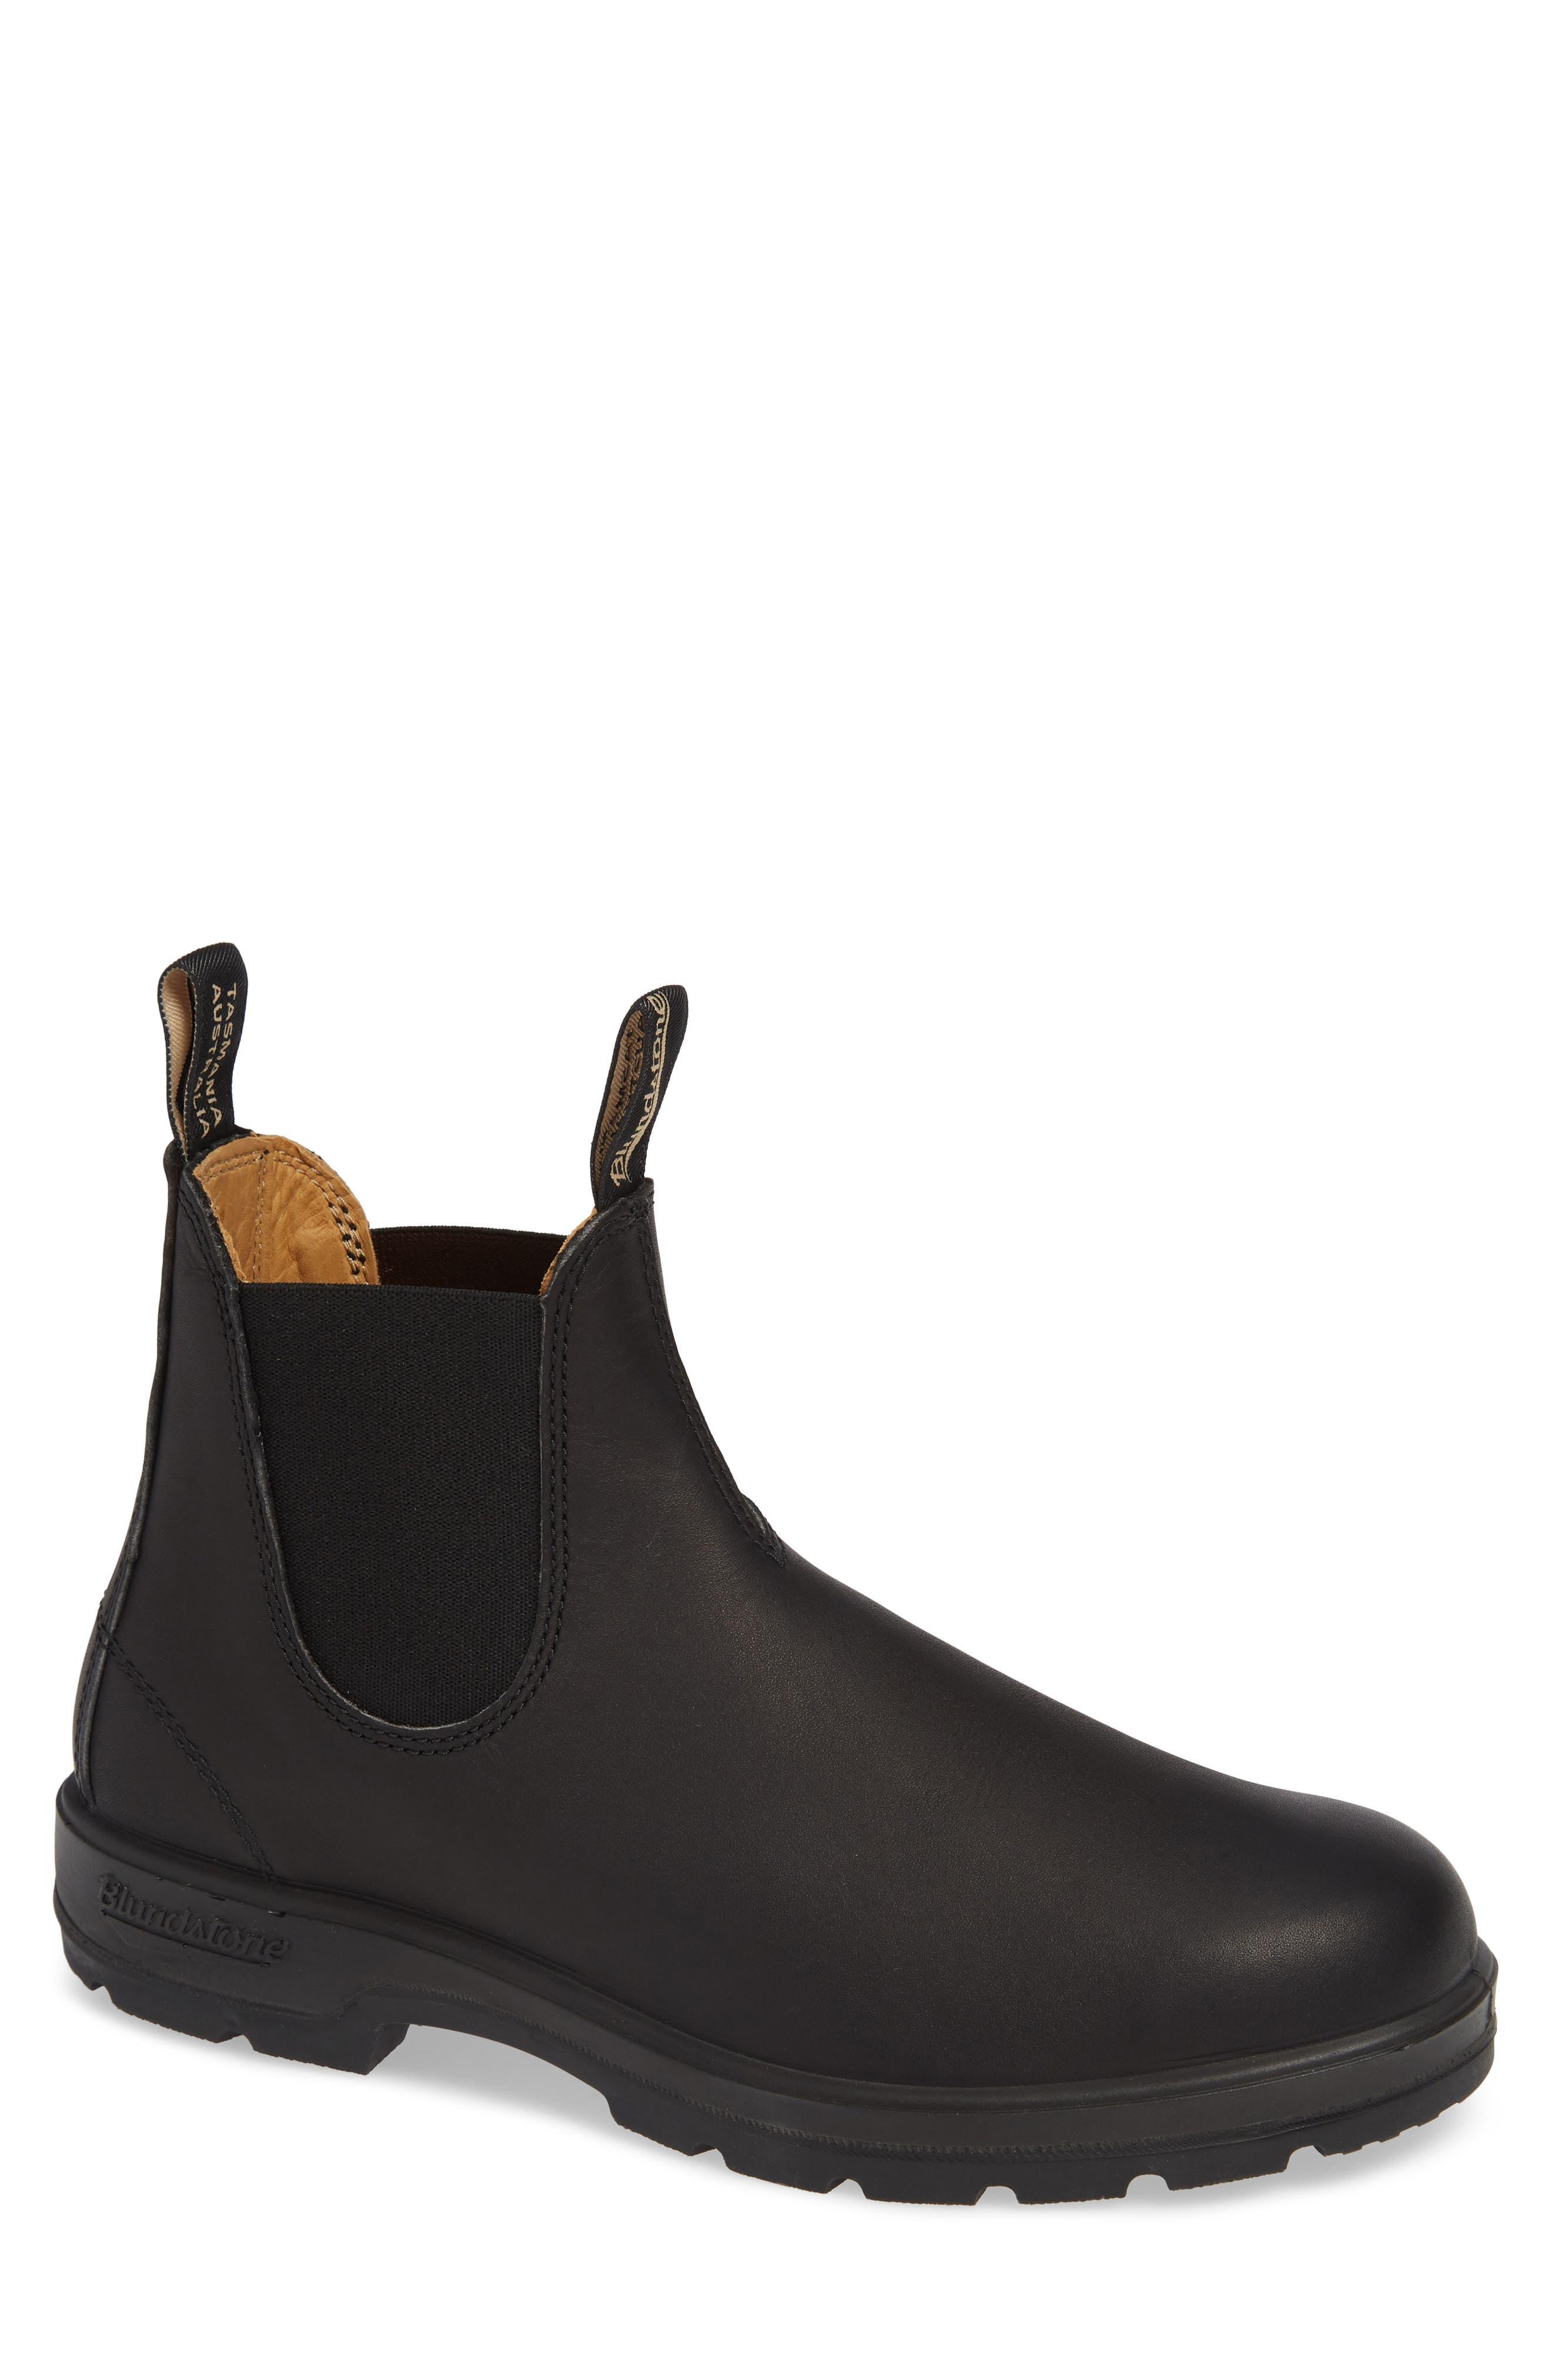 BLUNDSTONE FOOTWEAR Chelsea Boot, Main, color, BLACK